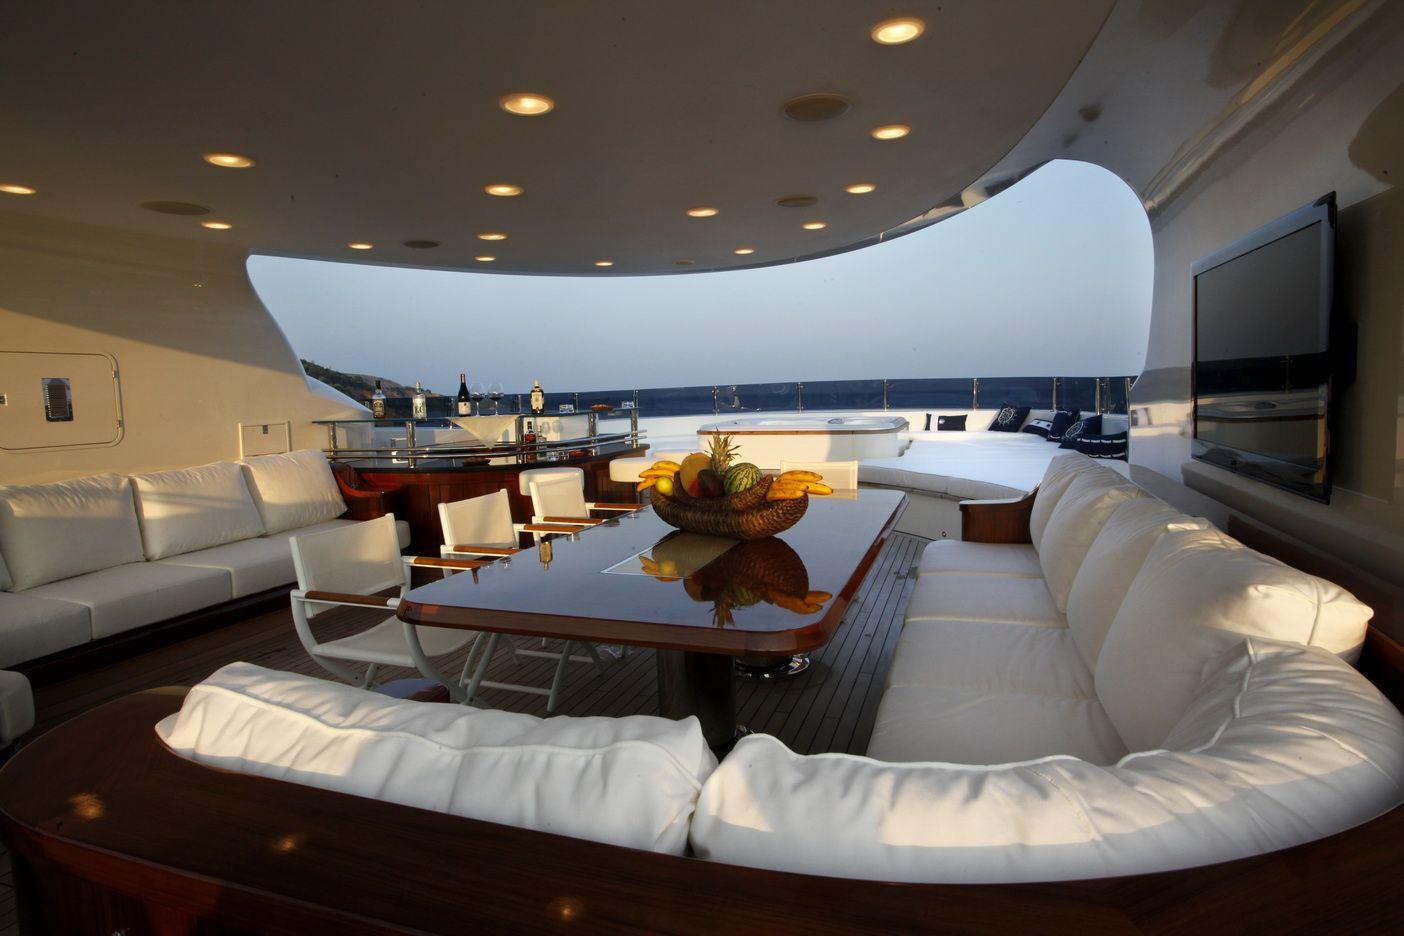 luxury yacht interiors google search yachts luxury yacht rh pinterest com luxury boat interior luxury boat interior pictures